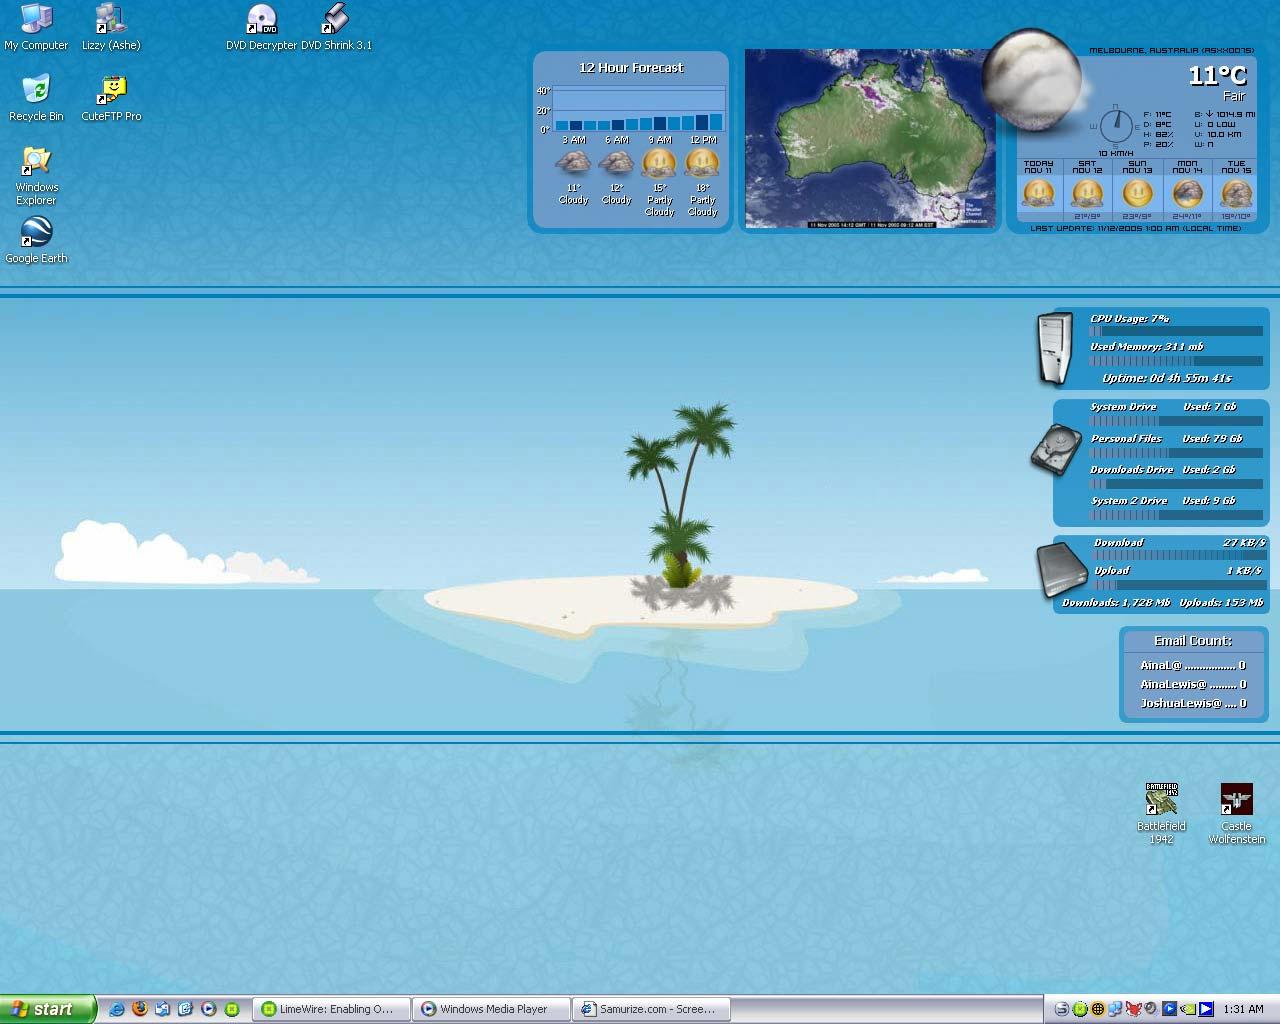 Title: Cartoon Island...